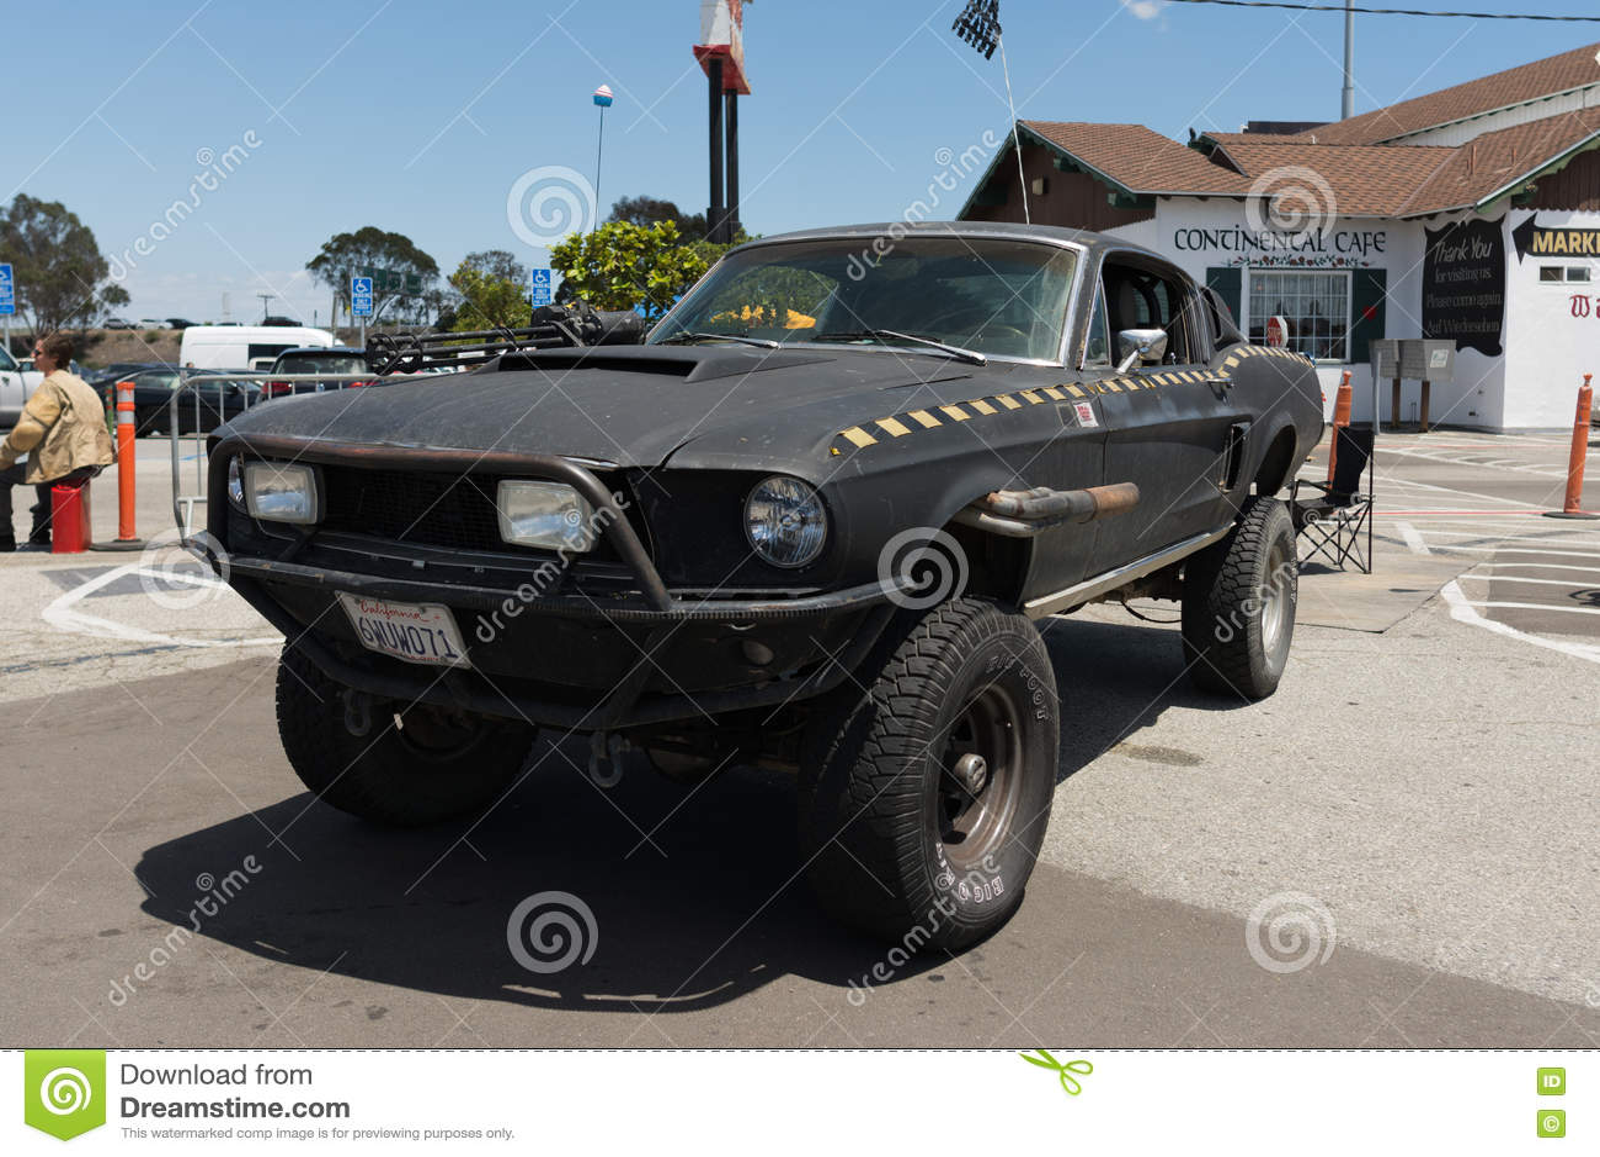 Apocalyptic car post